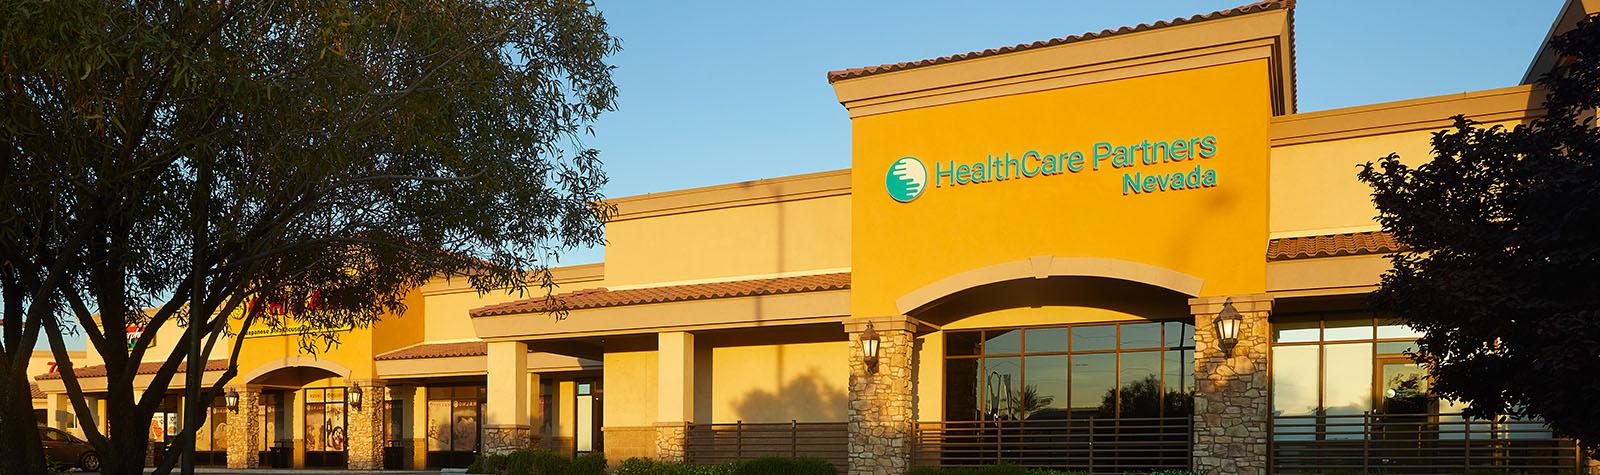 HealthCare Partners Nevada – Intermountain Healthcare Opens Newest myGeneration Senior Clinic